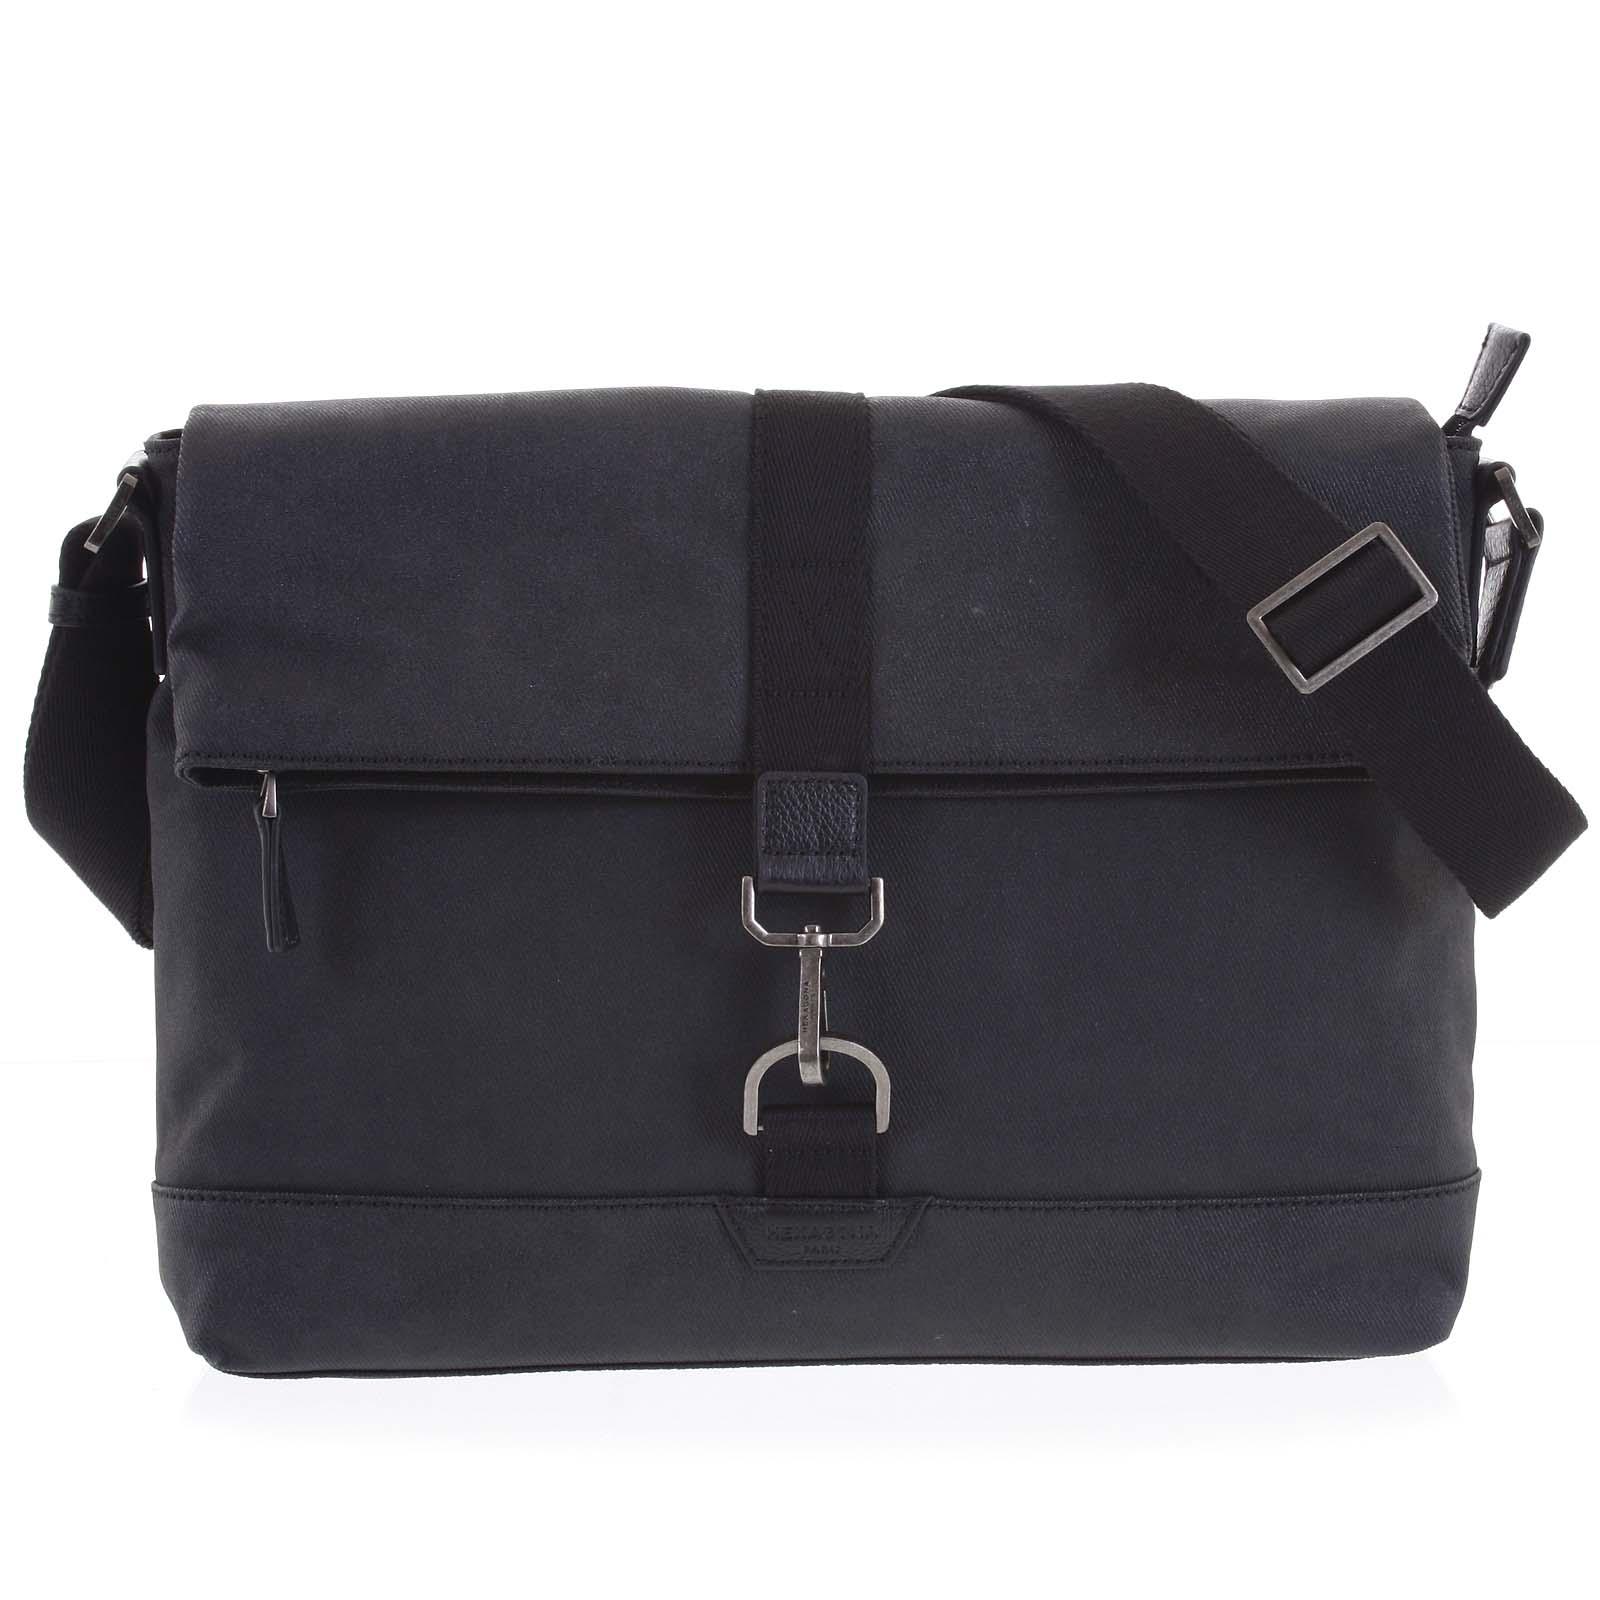 Pánská taška na notebook černá - Hexagona Cladrien